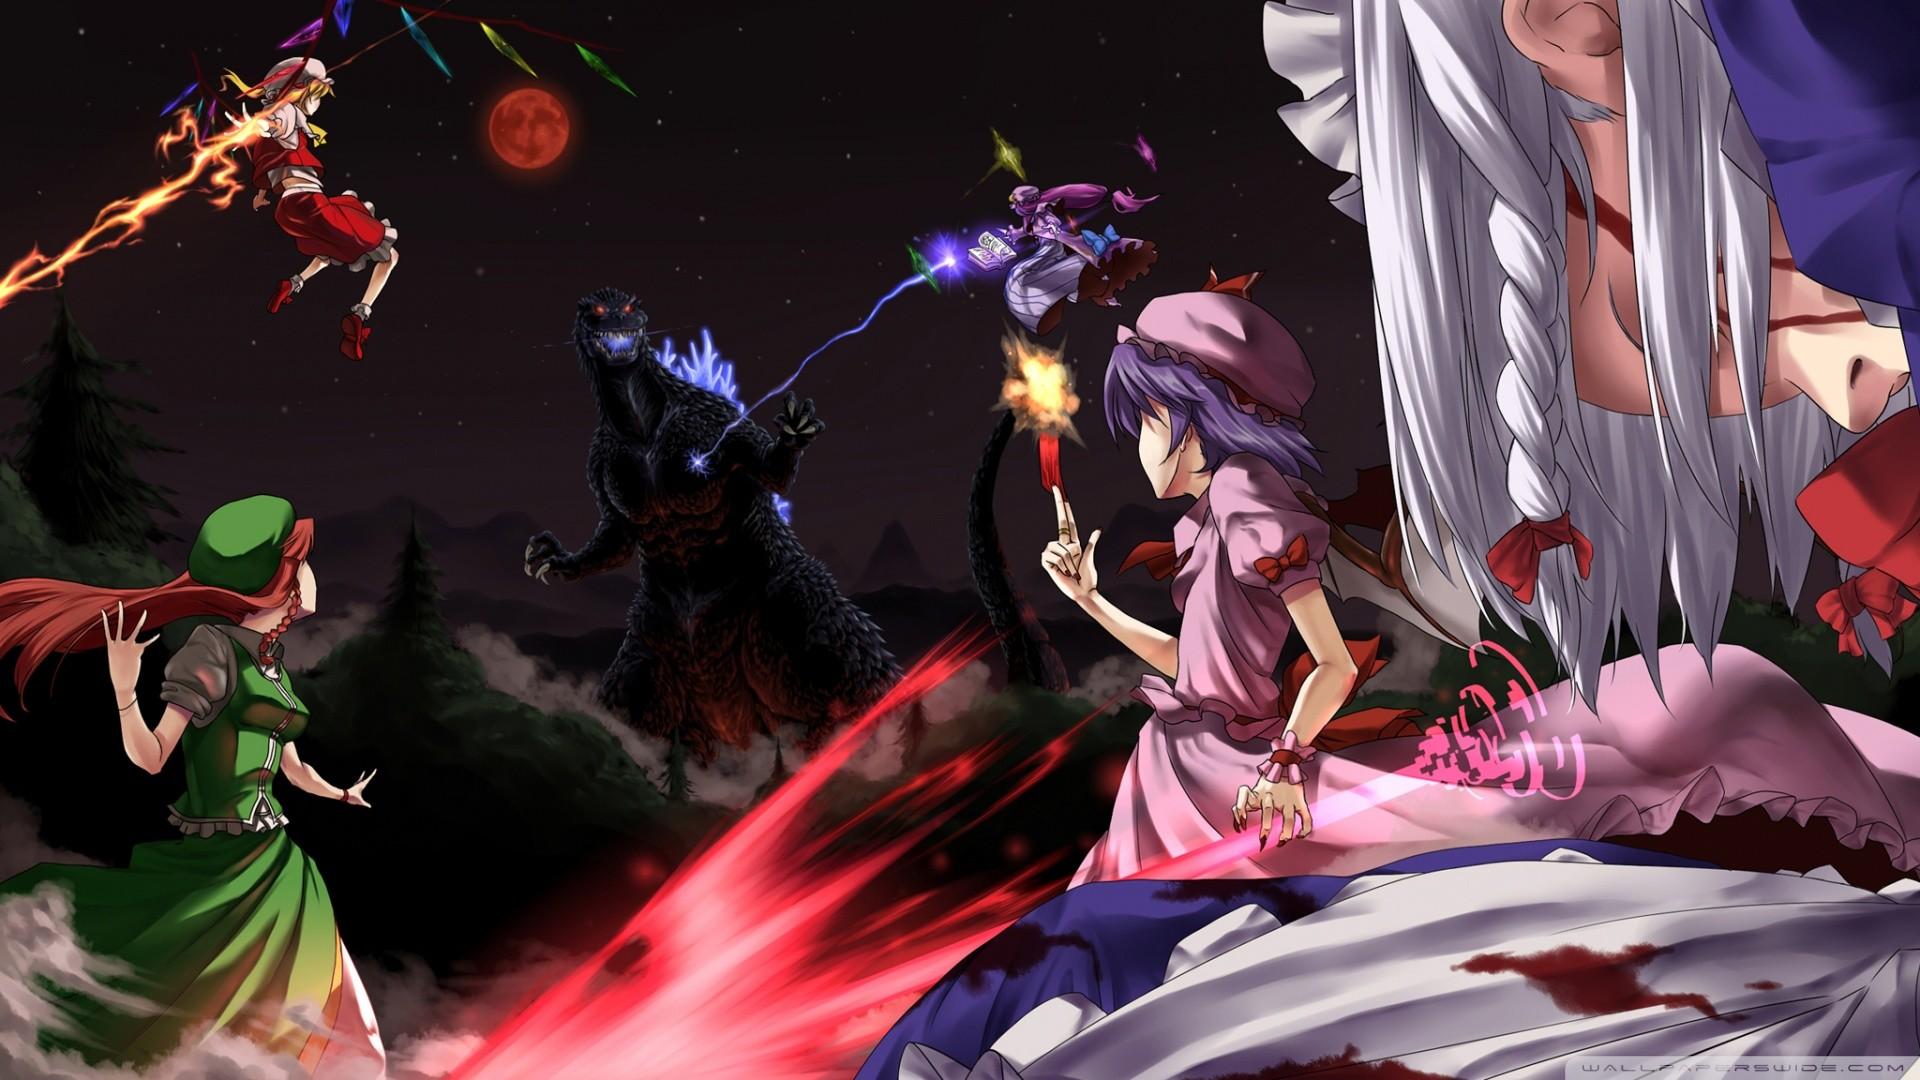 Anime – Touhou Flandre Scarlet Remilia Scarlet Patchouli Knowledge Sakuya  Izayoi Hong Meiling Wallpaper